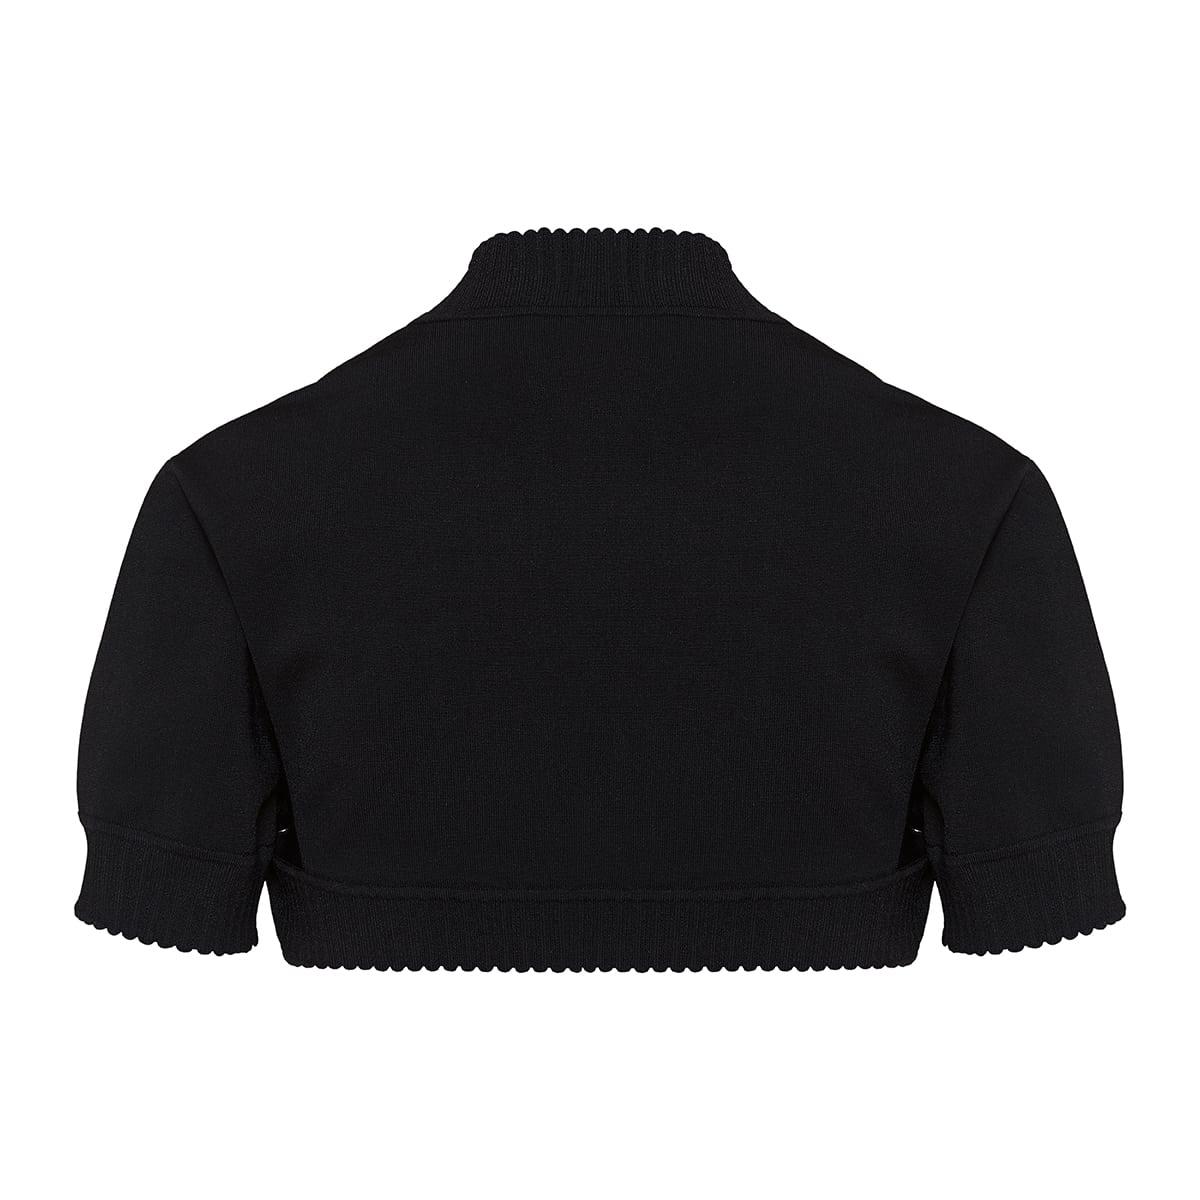 Bolero knitted top